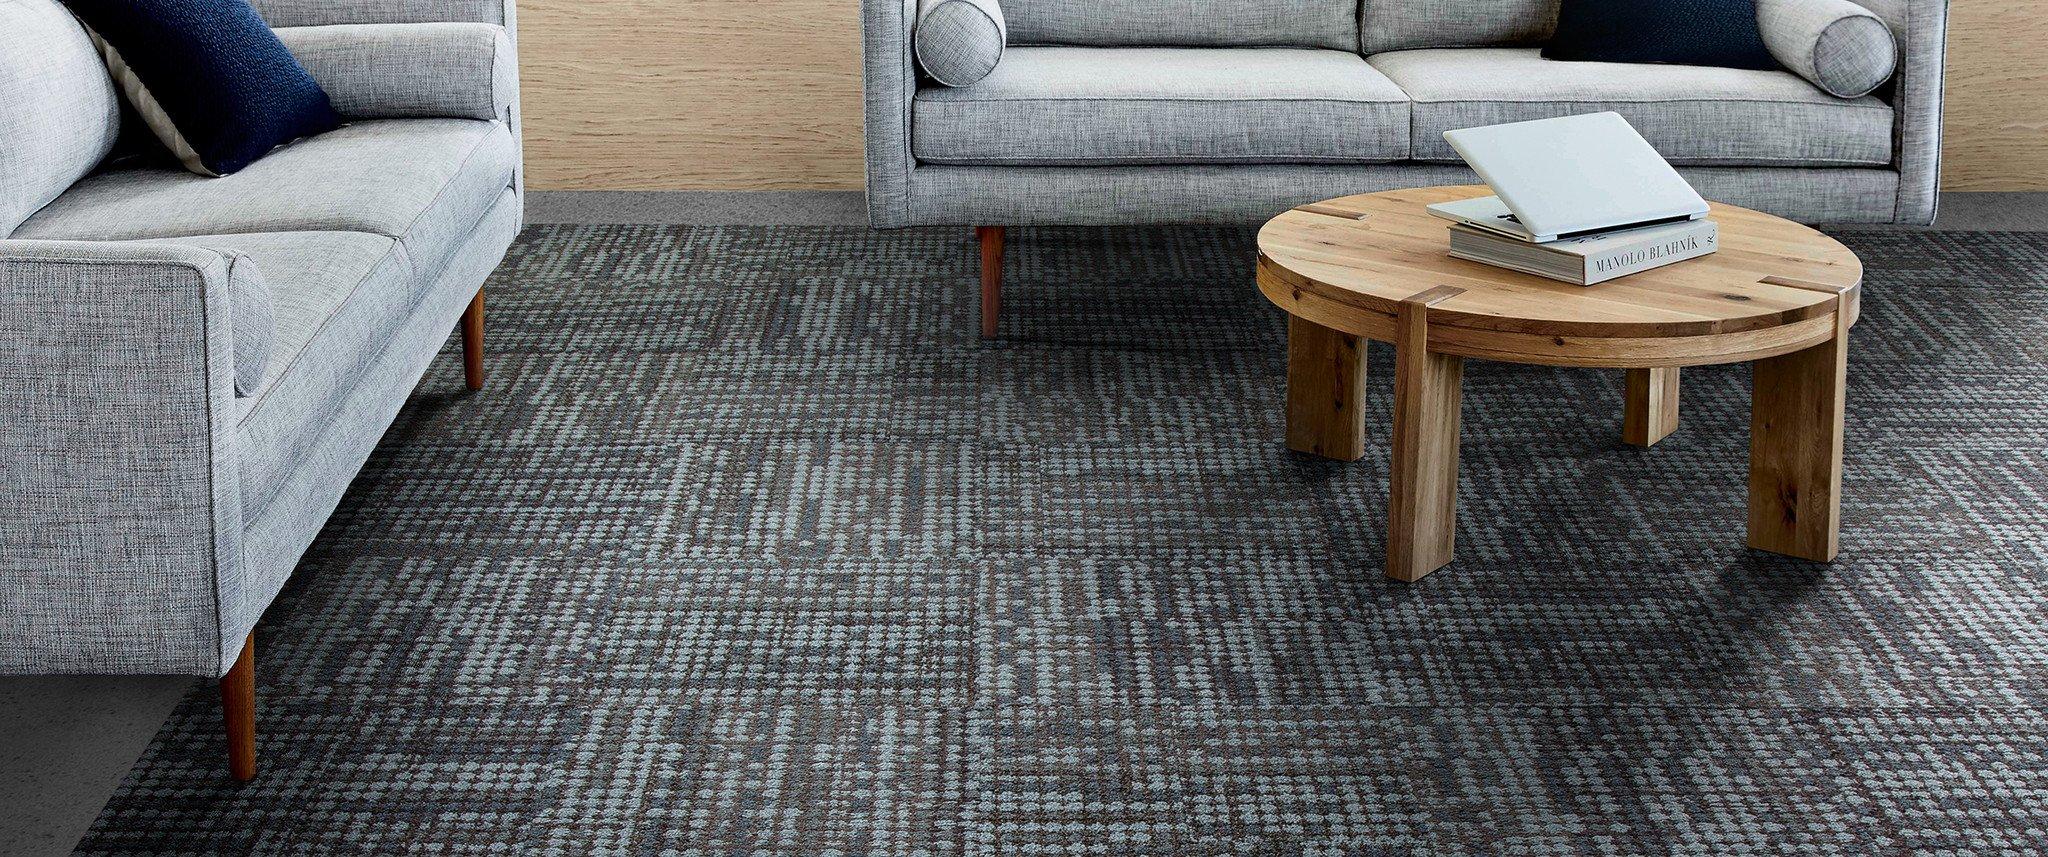 Carpet tiles - West Elme work area VGPFTNI